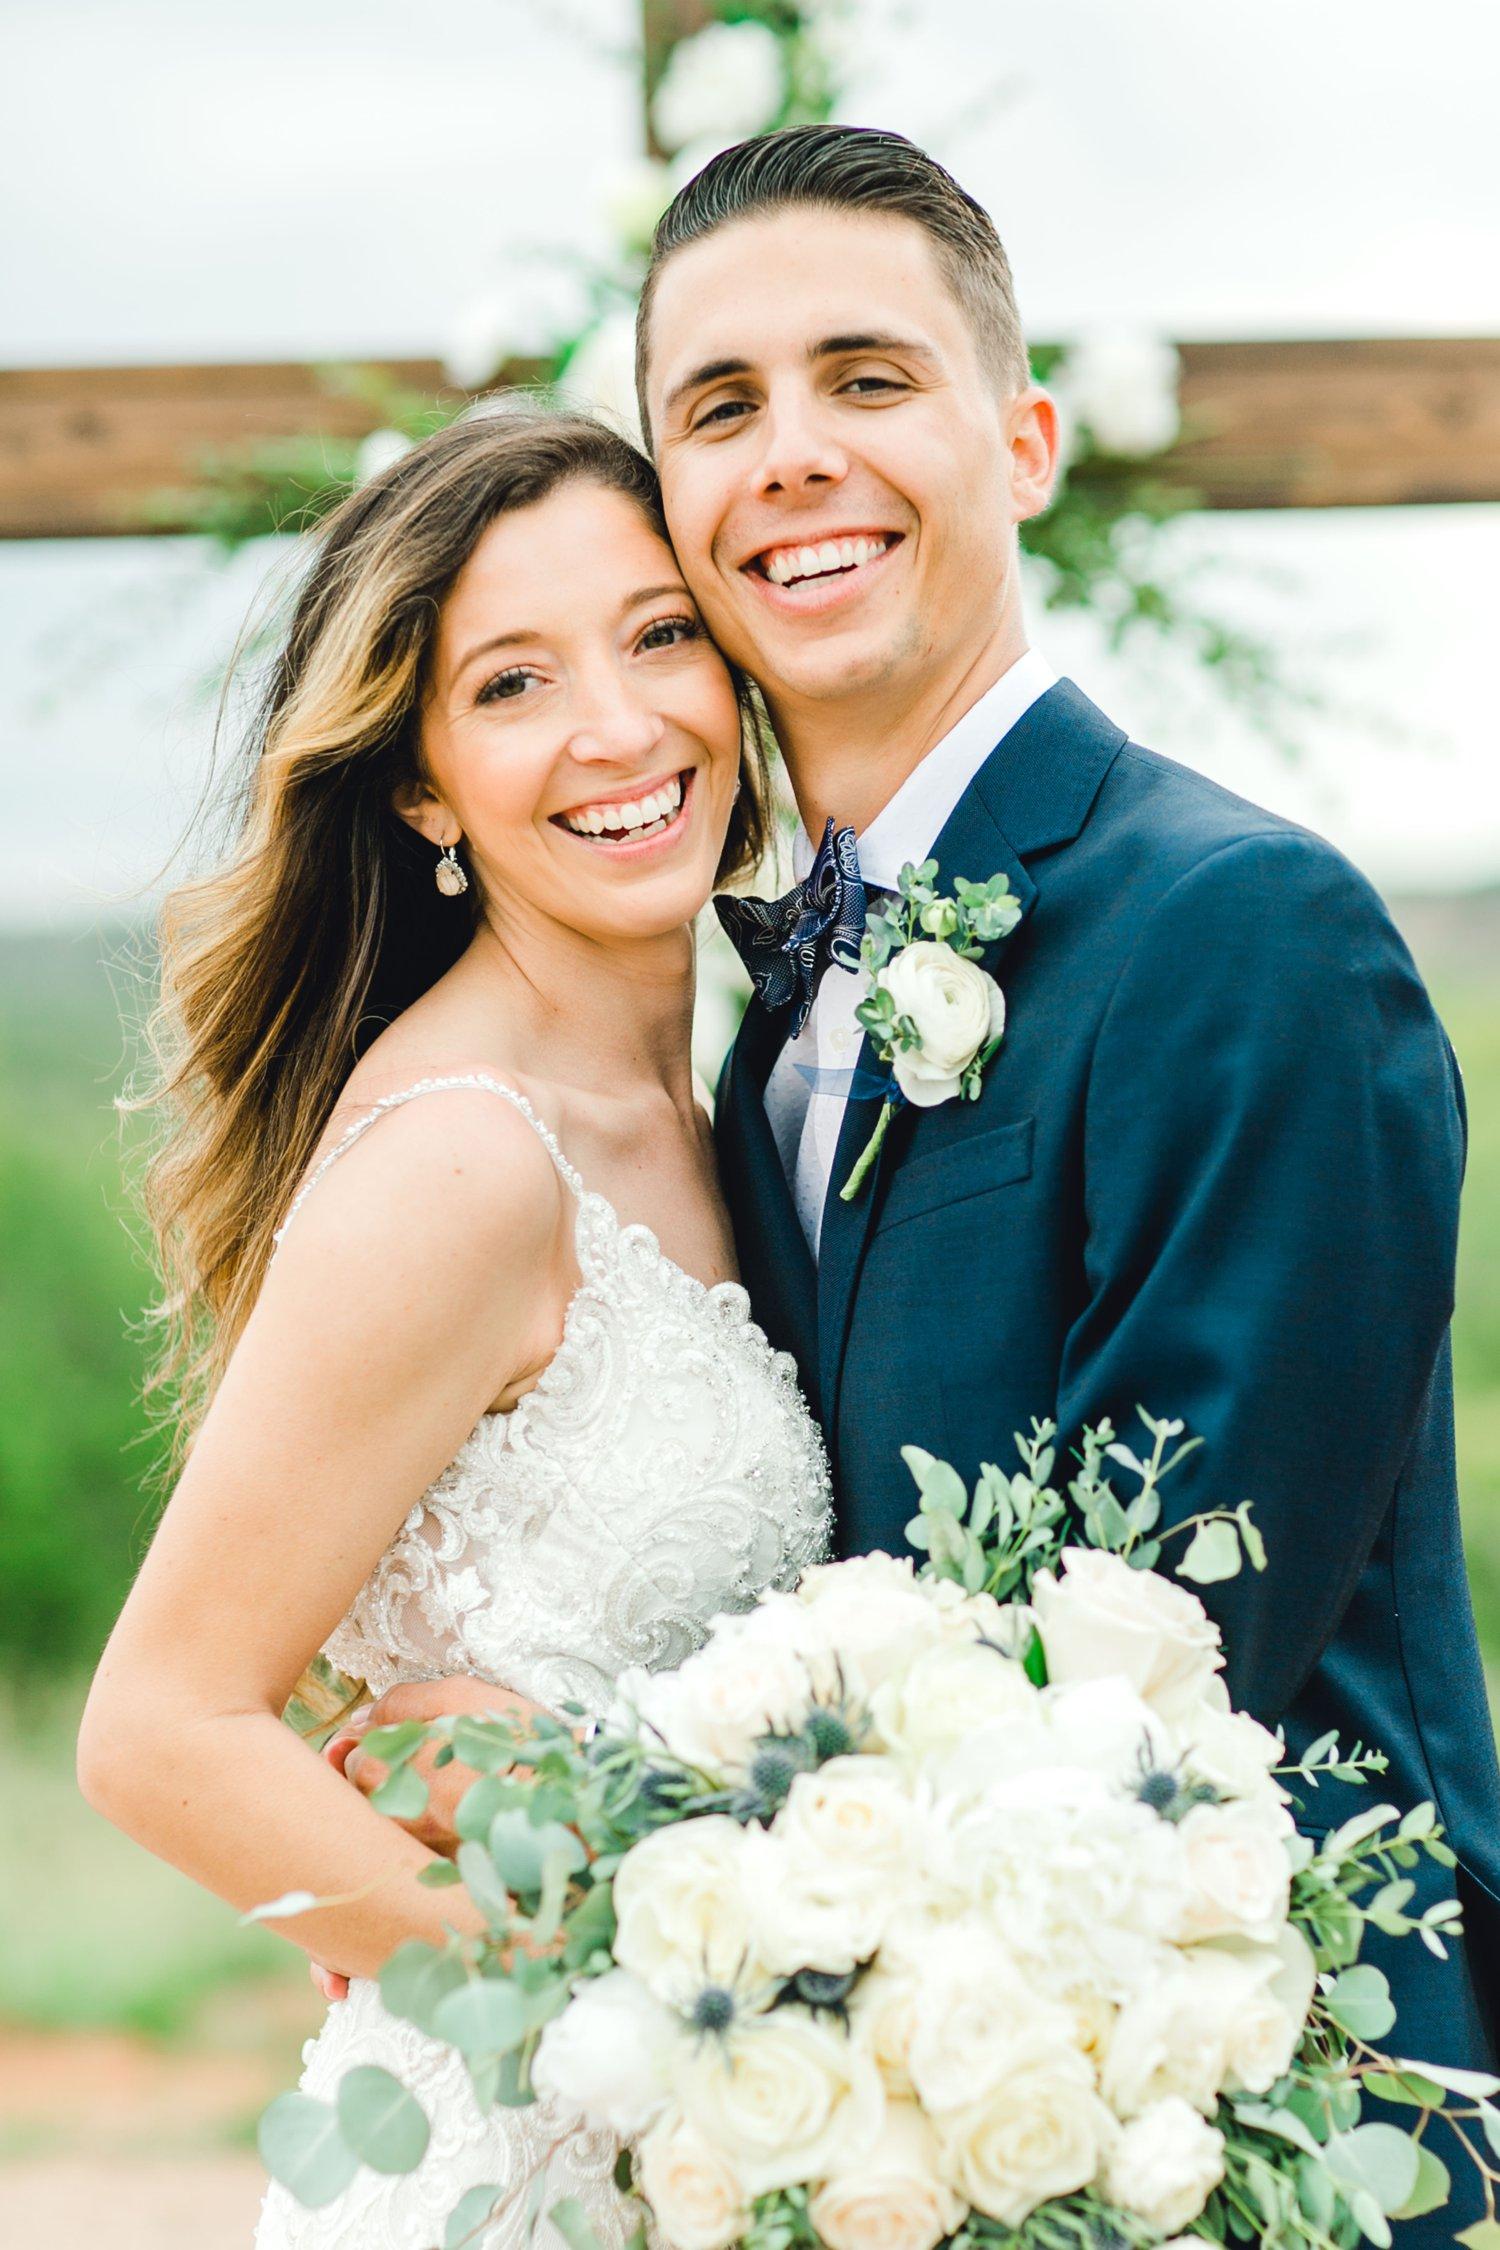 Ashley_John_English_Elegant_Texas_Wedding_Outdoors_Ranch_Caprock_Winery_ALLEEJ_0076.jpg